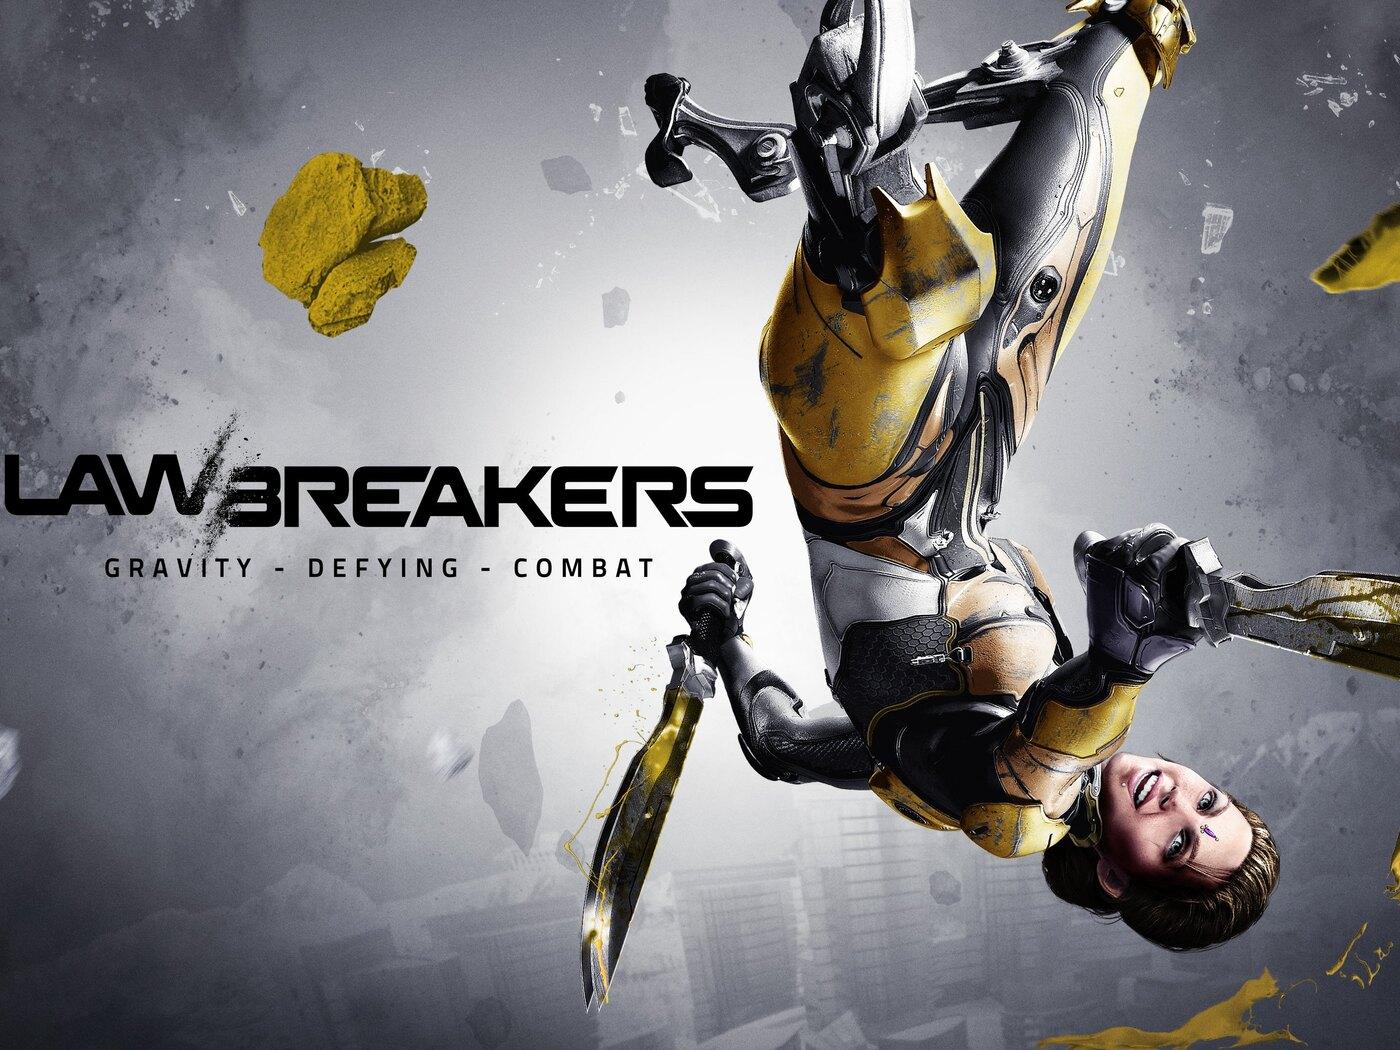 lawbreakers-qj.jpg